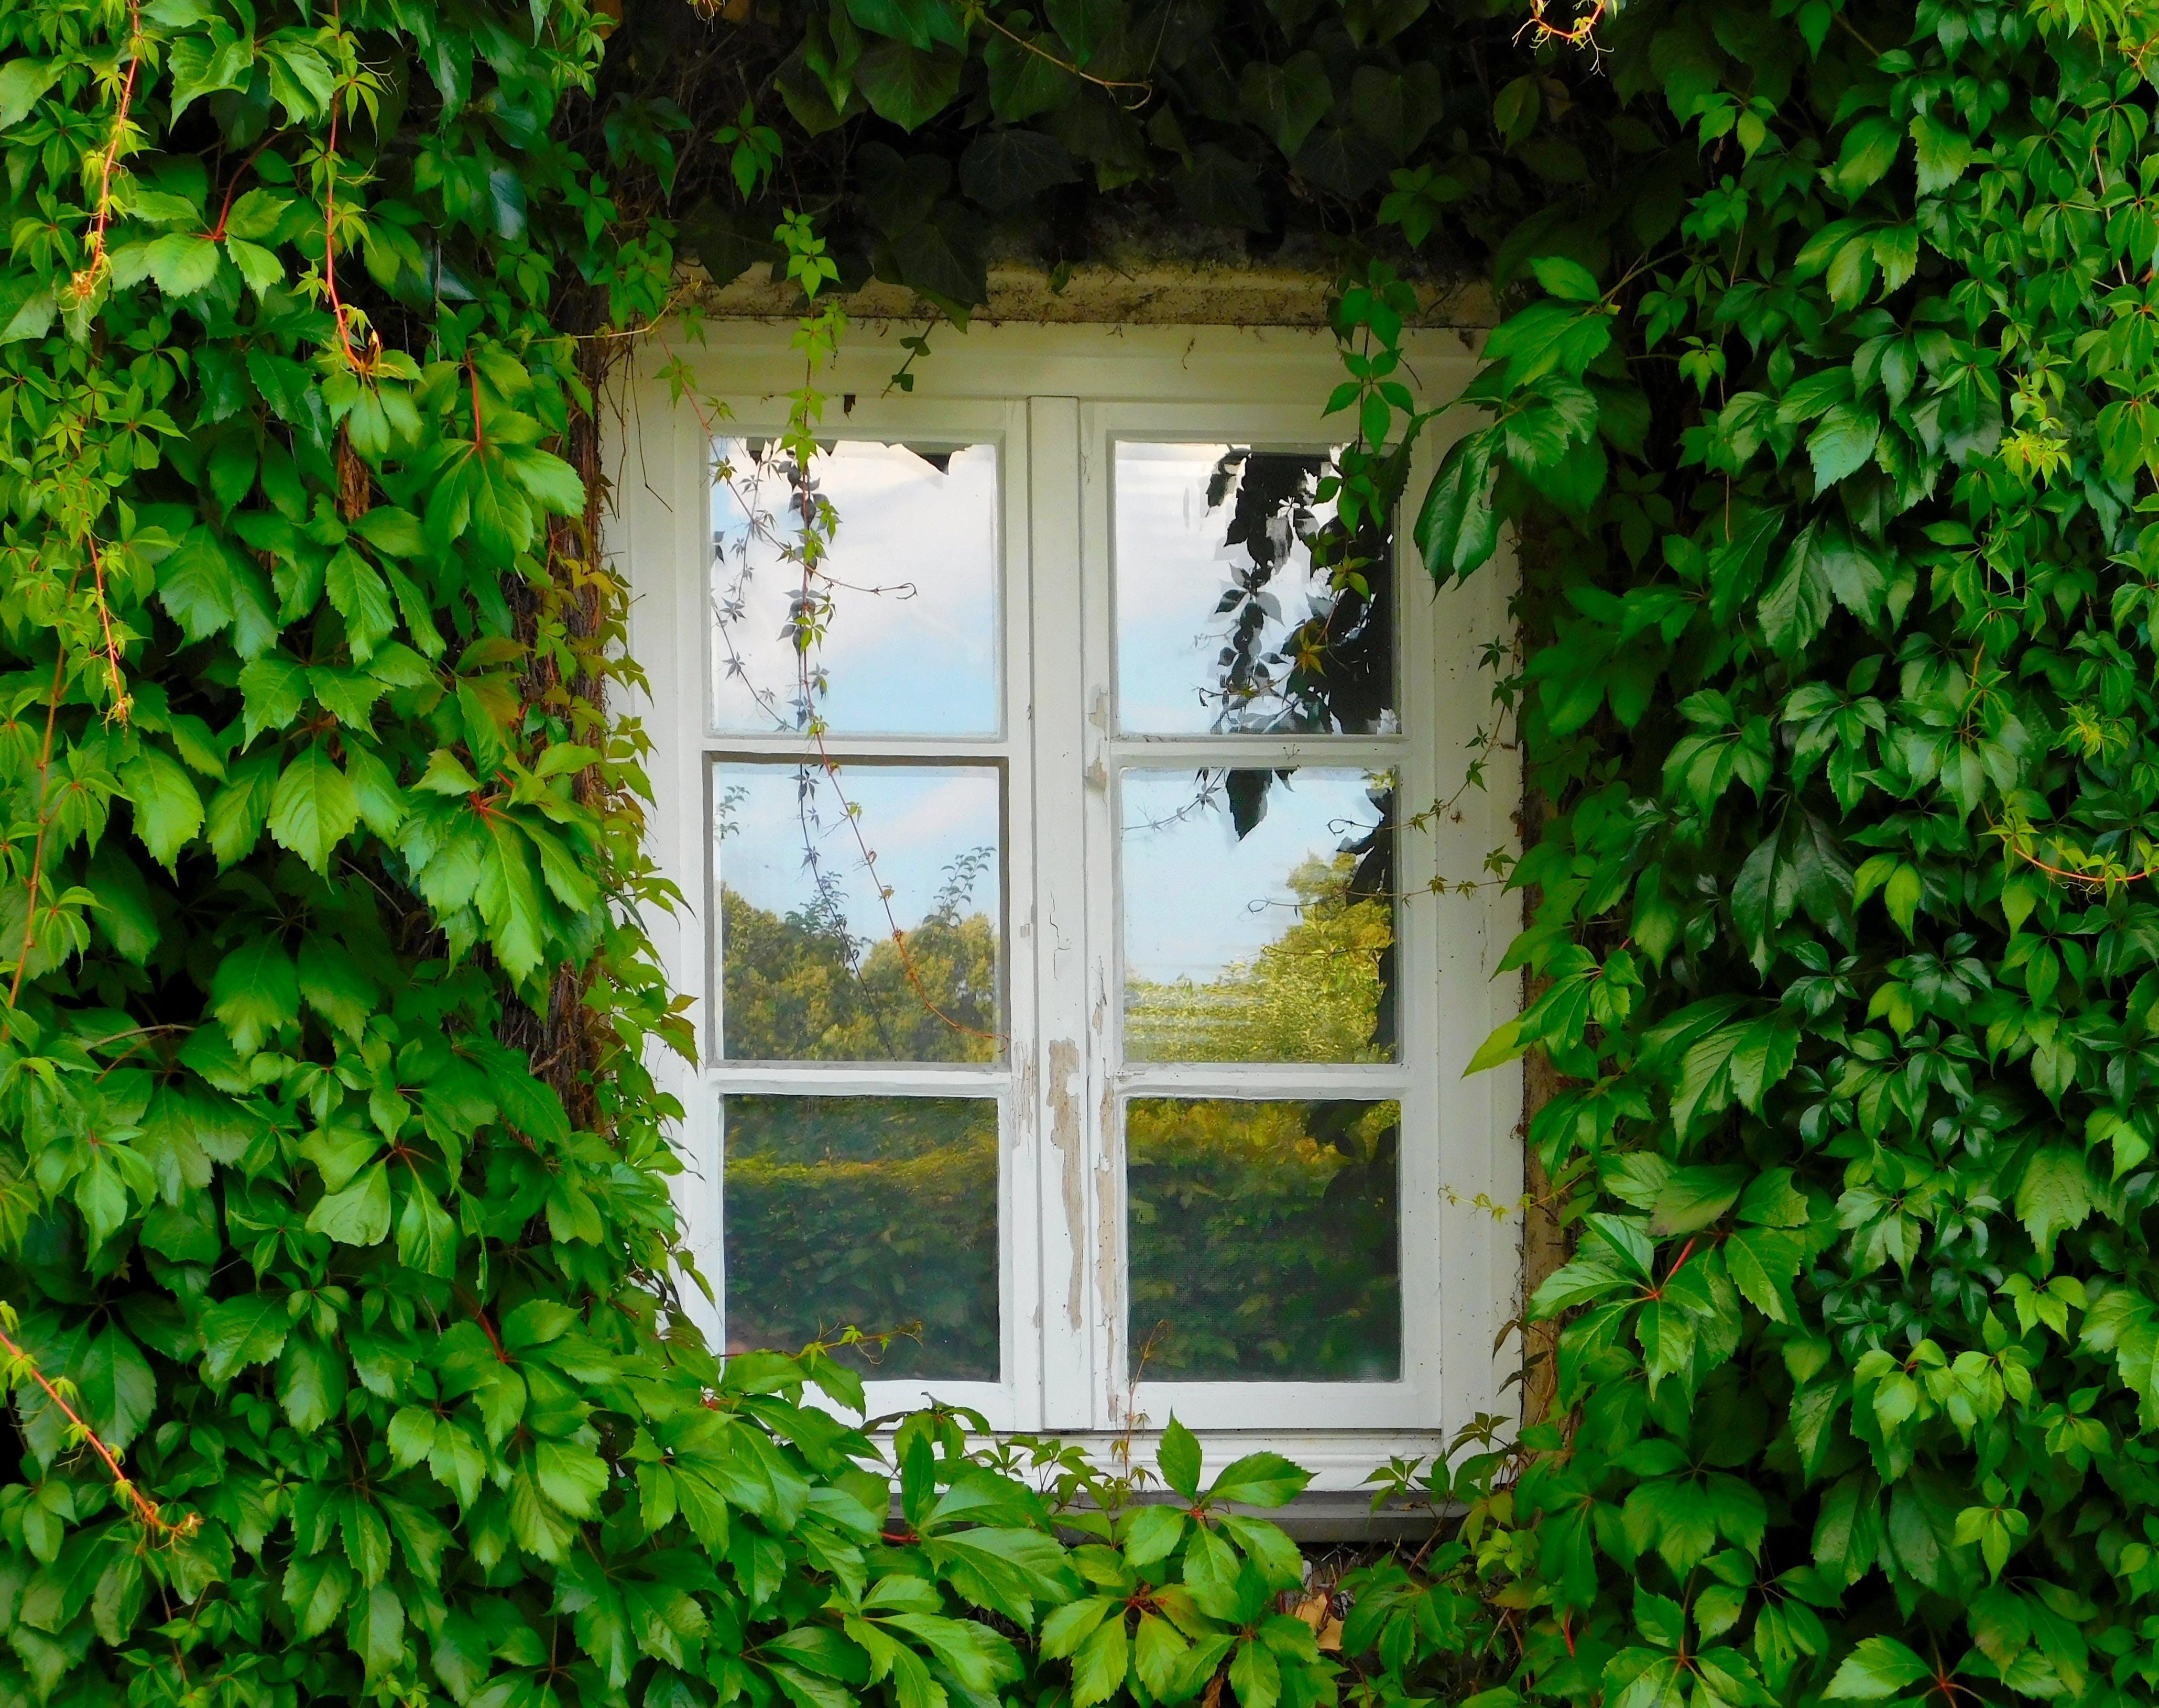 Free stock photo of wall, plant, window, green